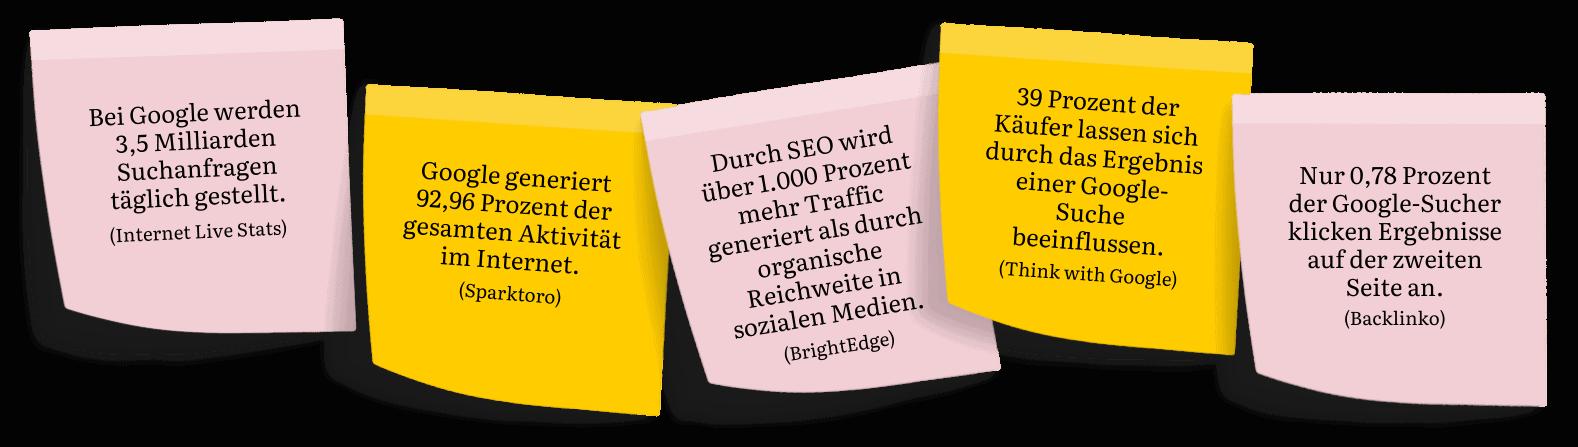 Statistiken zum Thema SEO.